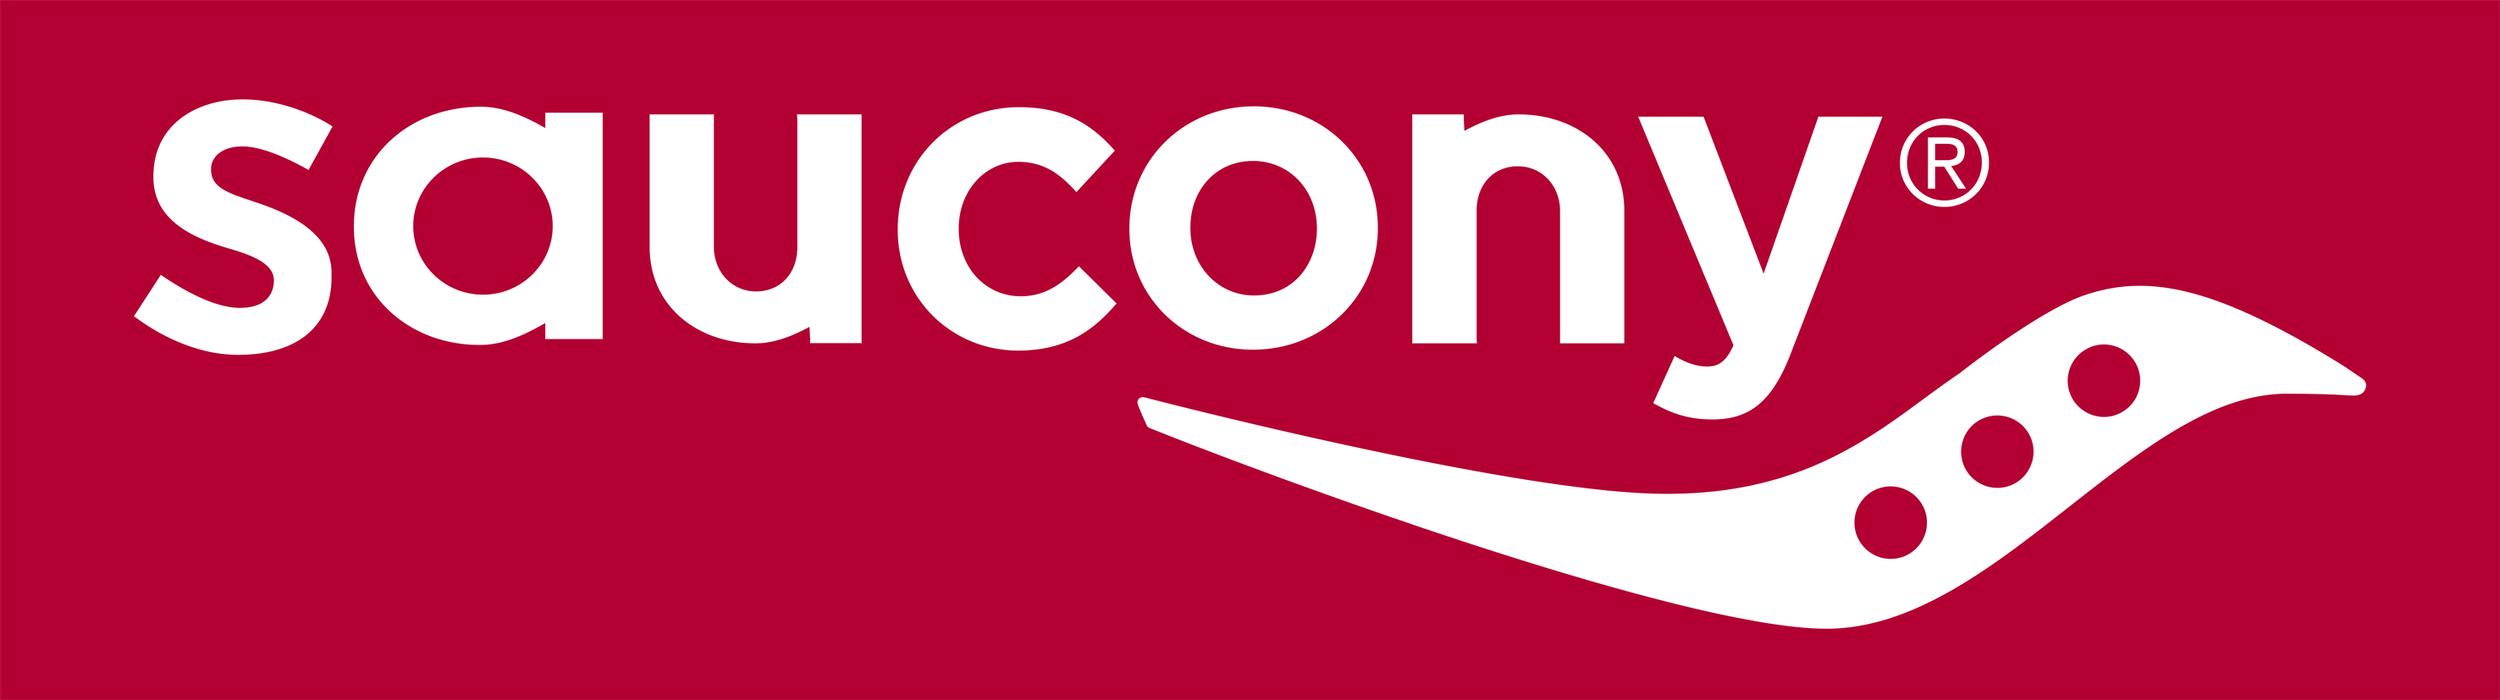 saucony-logo-banner-red-bck.jpg